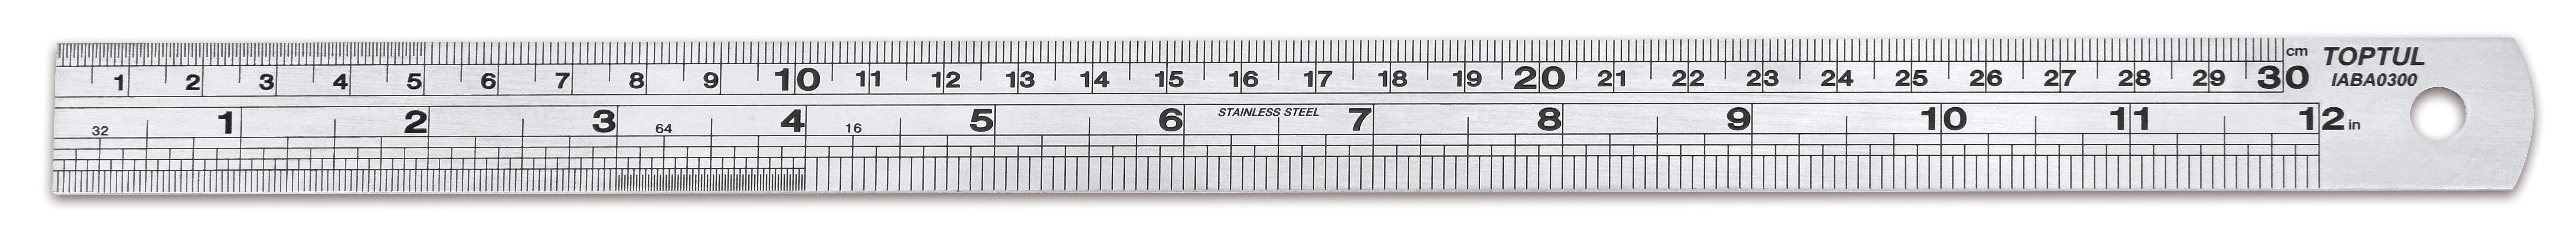 "QIABA1000 Stainless Steel Ruler 100cm (40"")"